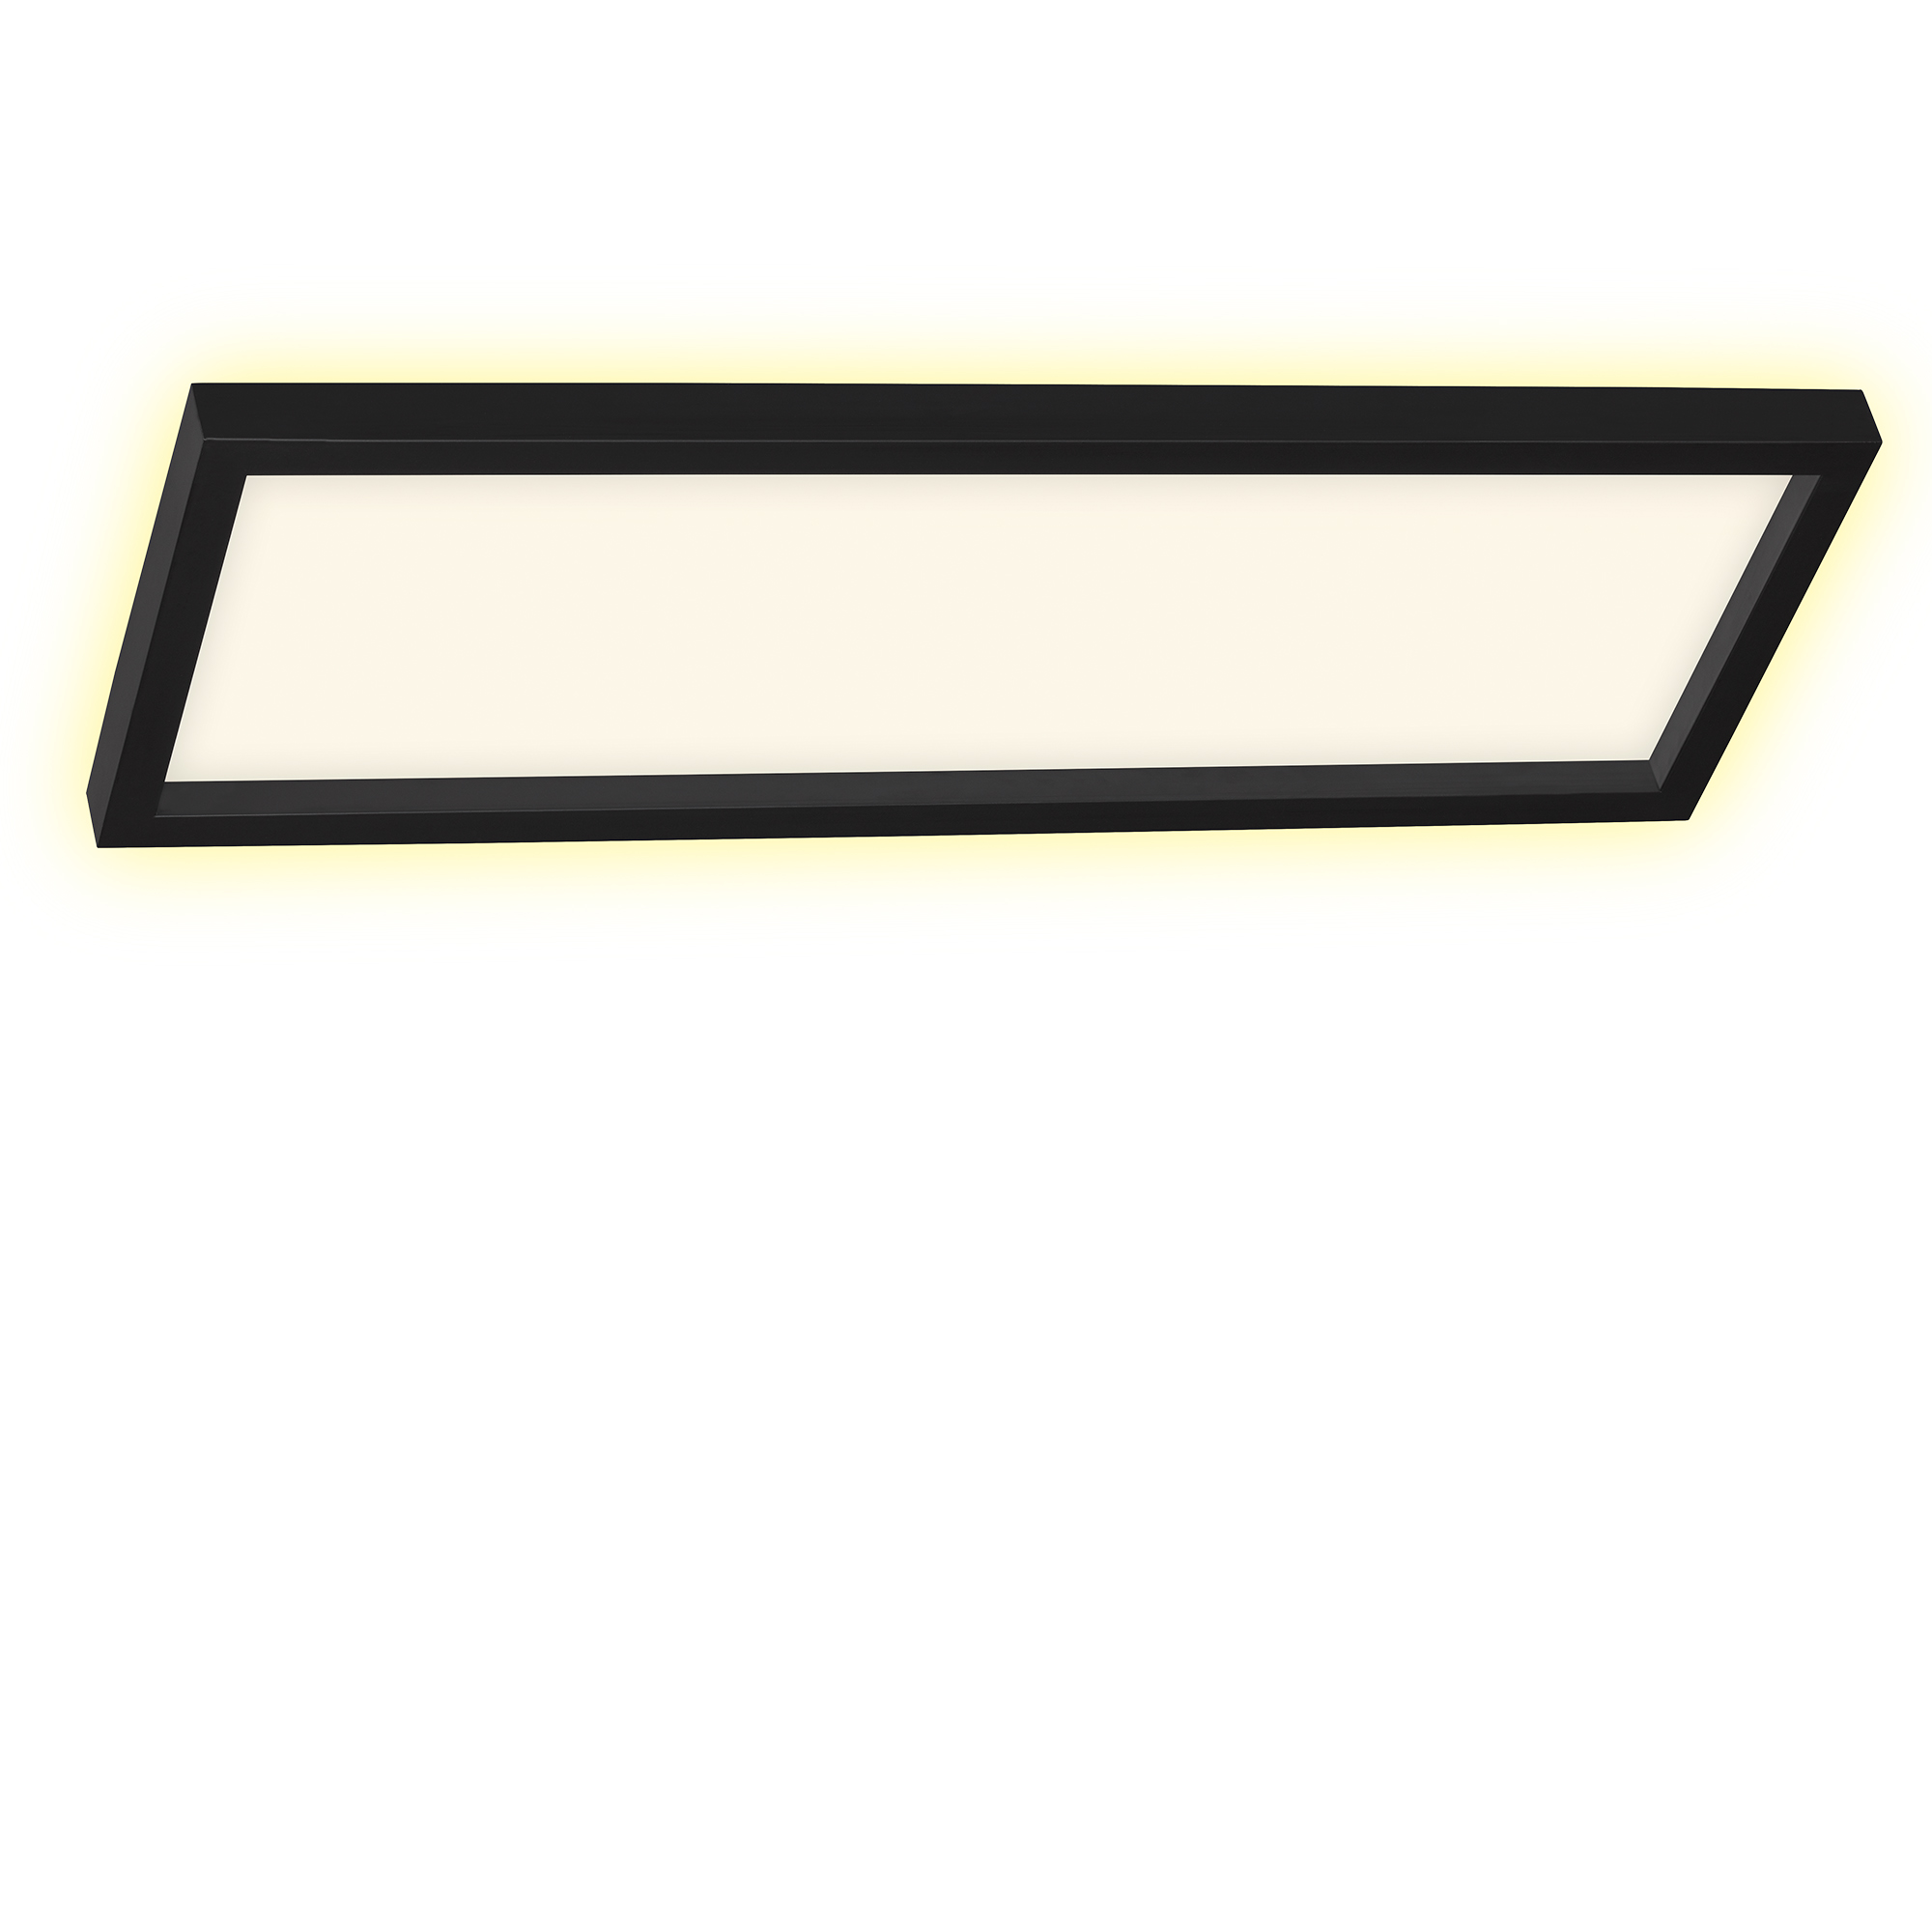 LED Panel, 58,2 cm, 3000 LUMEN, 22 WATT, Schwarz